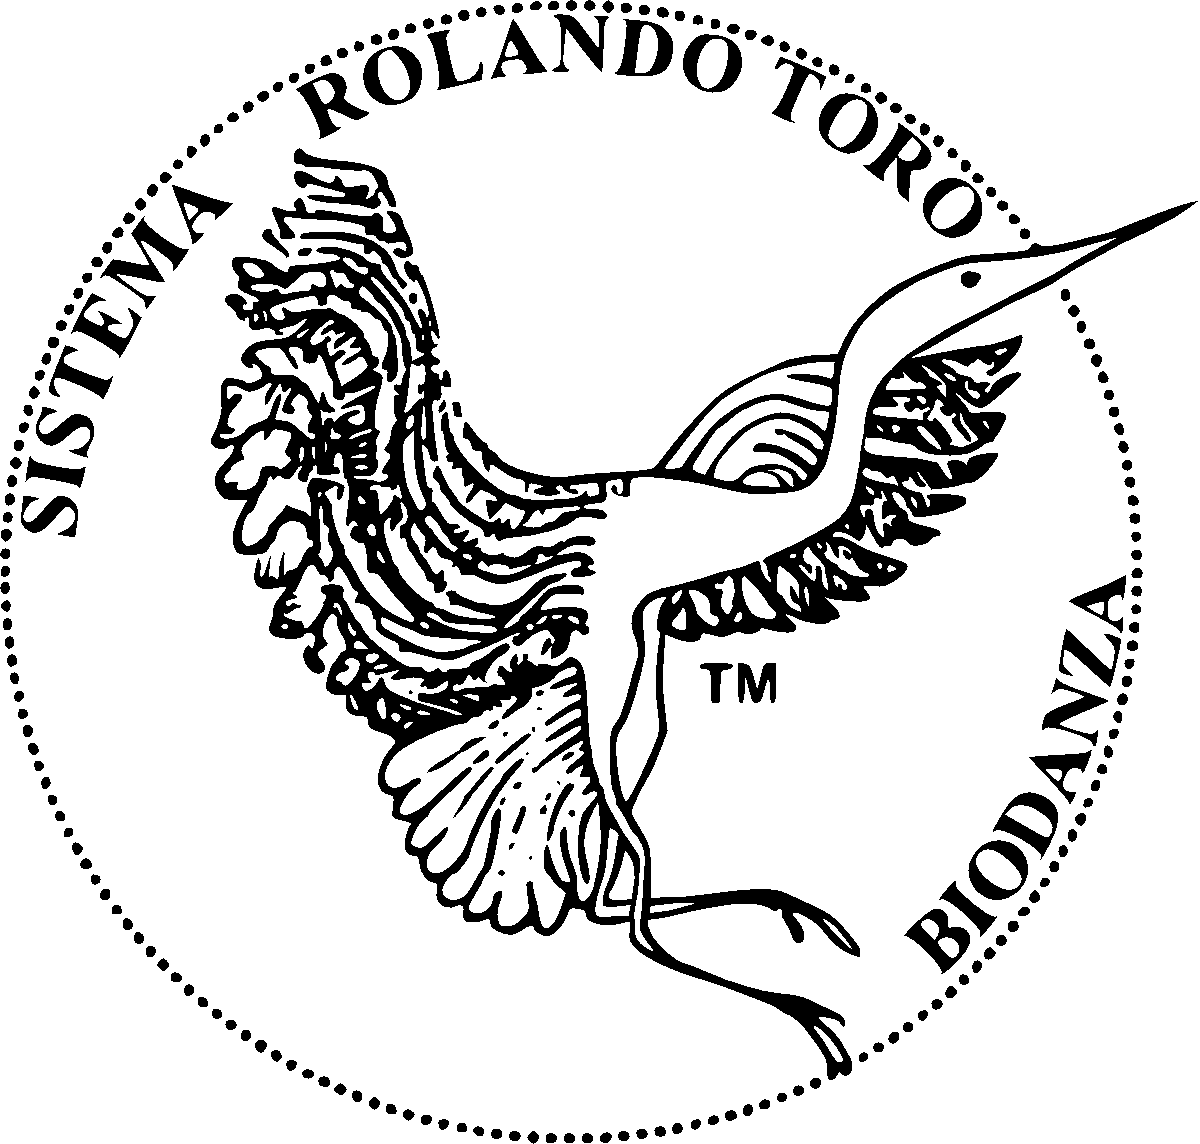 biodanza-logo-ibf-vectorizado-with-background